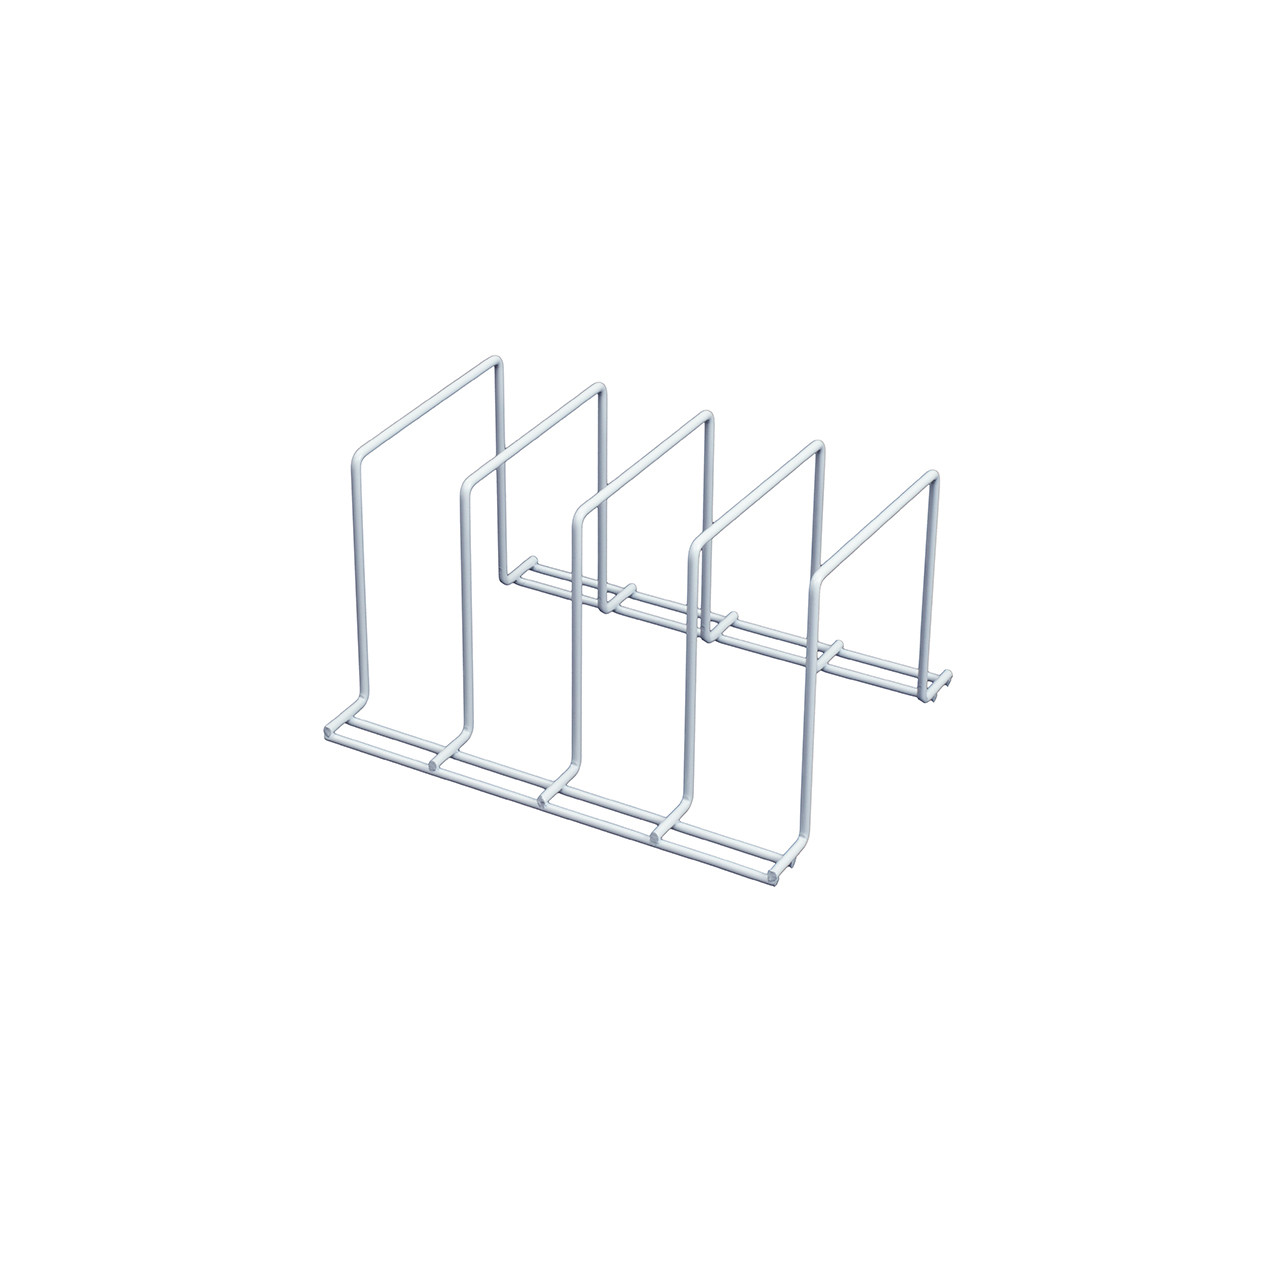 Kitchen Divider - 4 Sort